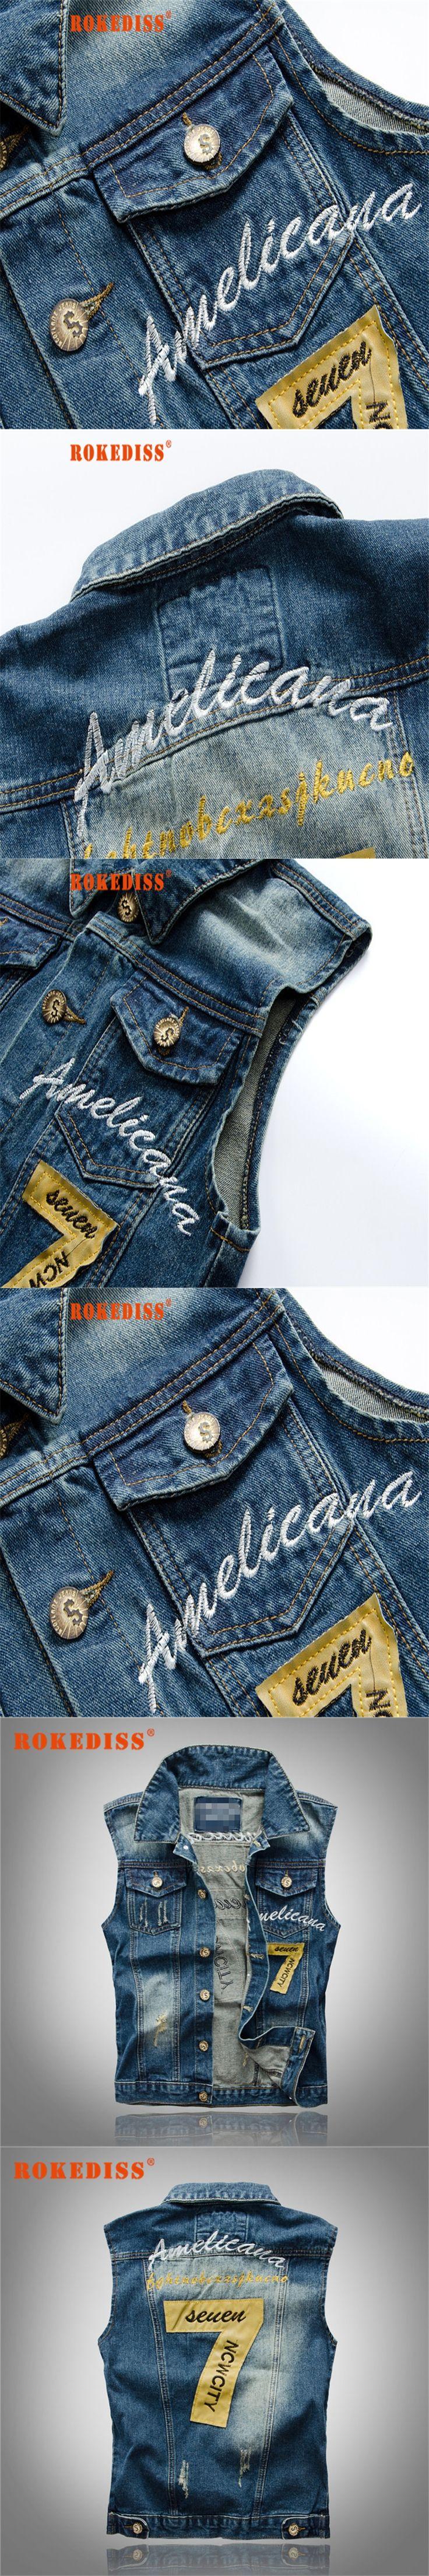 Denim Jeans Vest Men Letter Embroidery Male Jeans Waistcoat Hole Washed Cowboy Jean Denim Vest Sleeveless  5XL G265